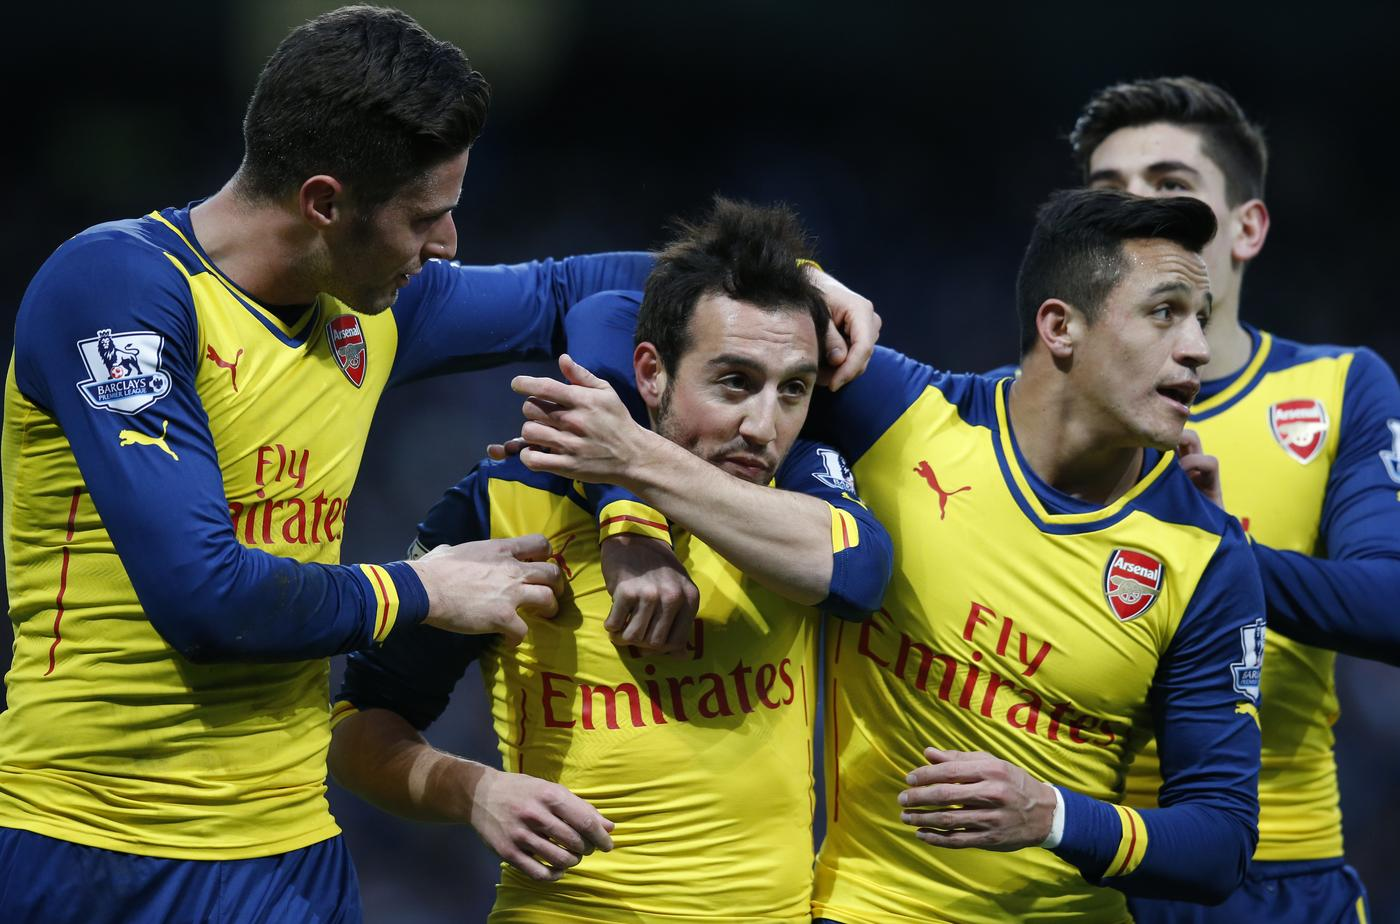 Arsenal's Santi Cazorla would be ideal Barcelona signing, says Xavi